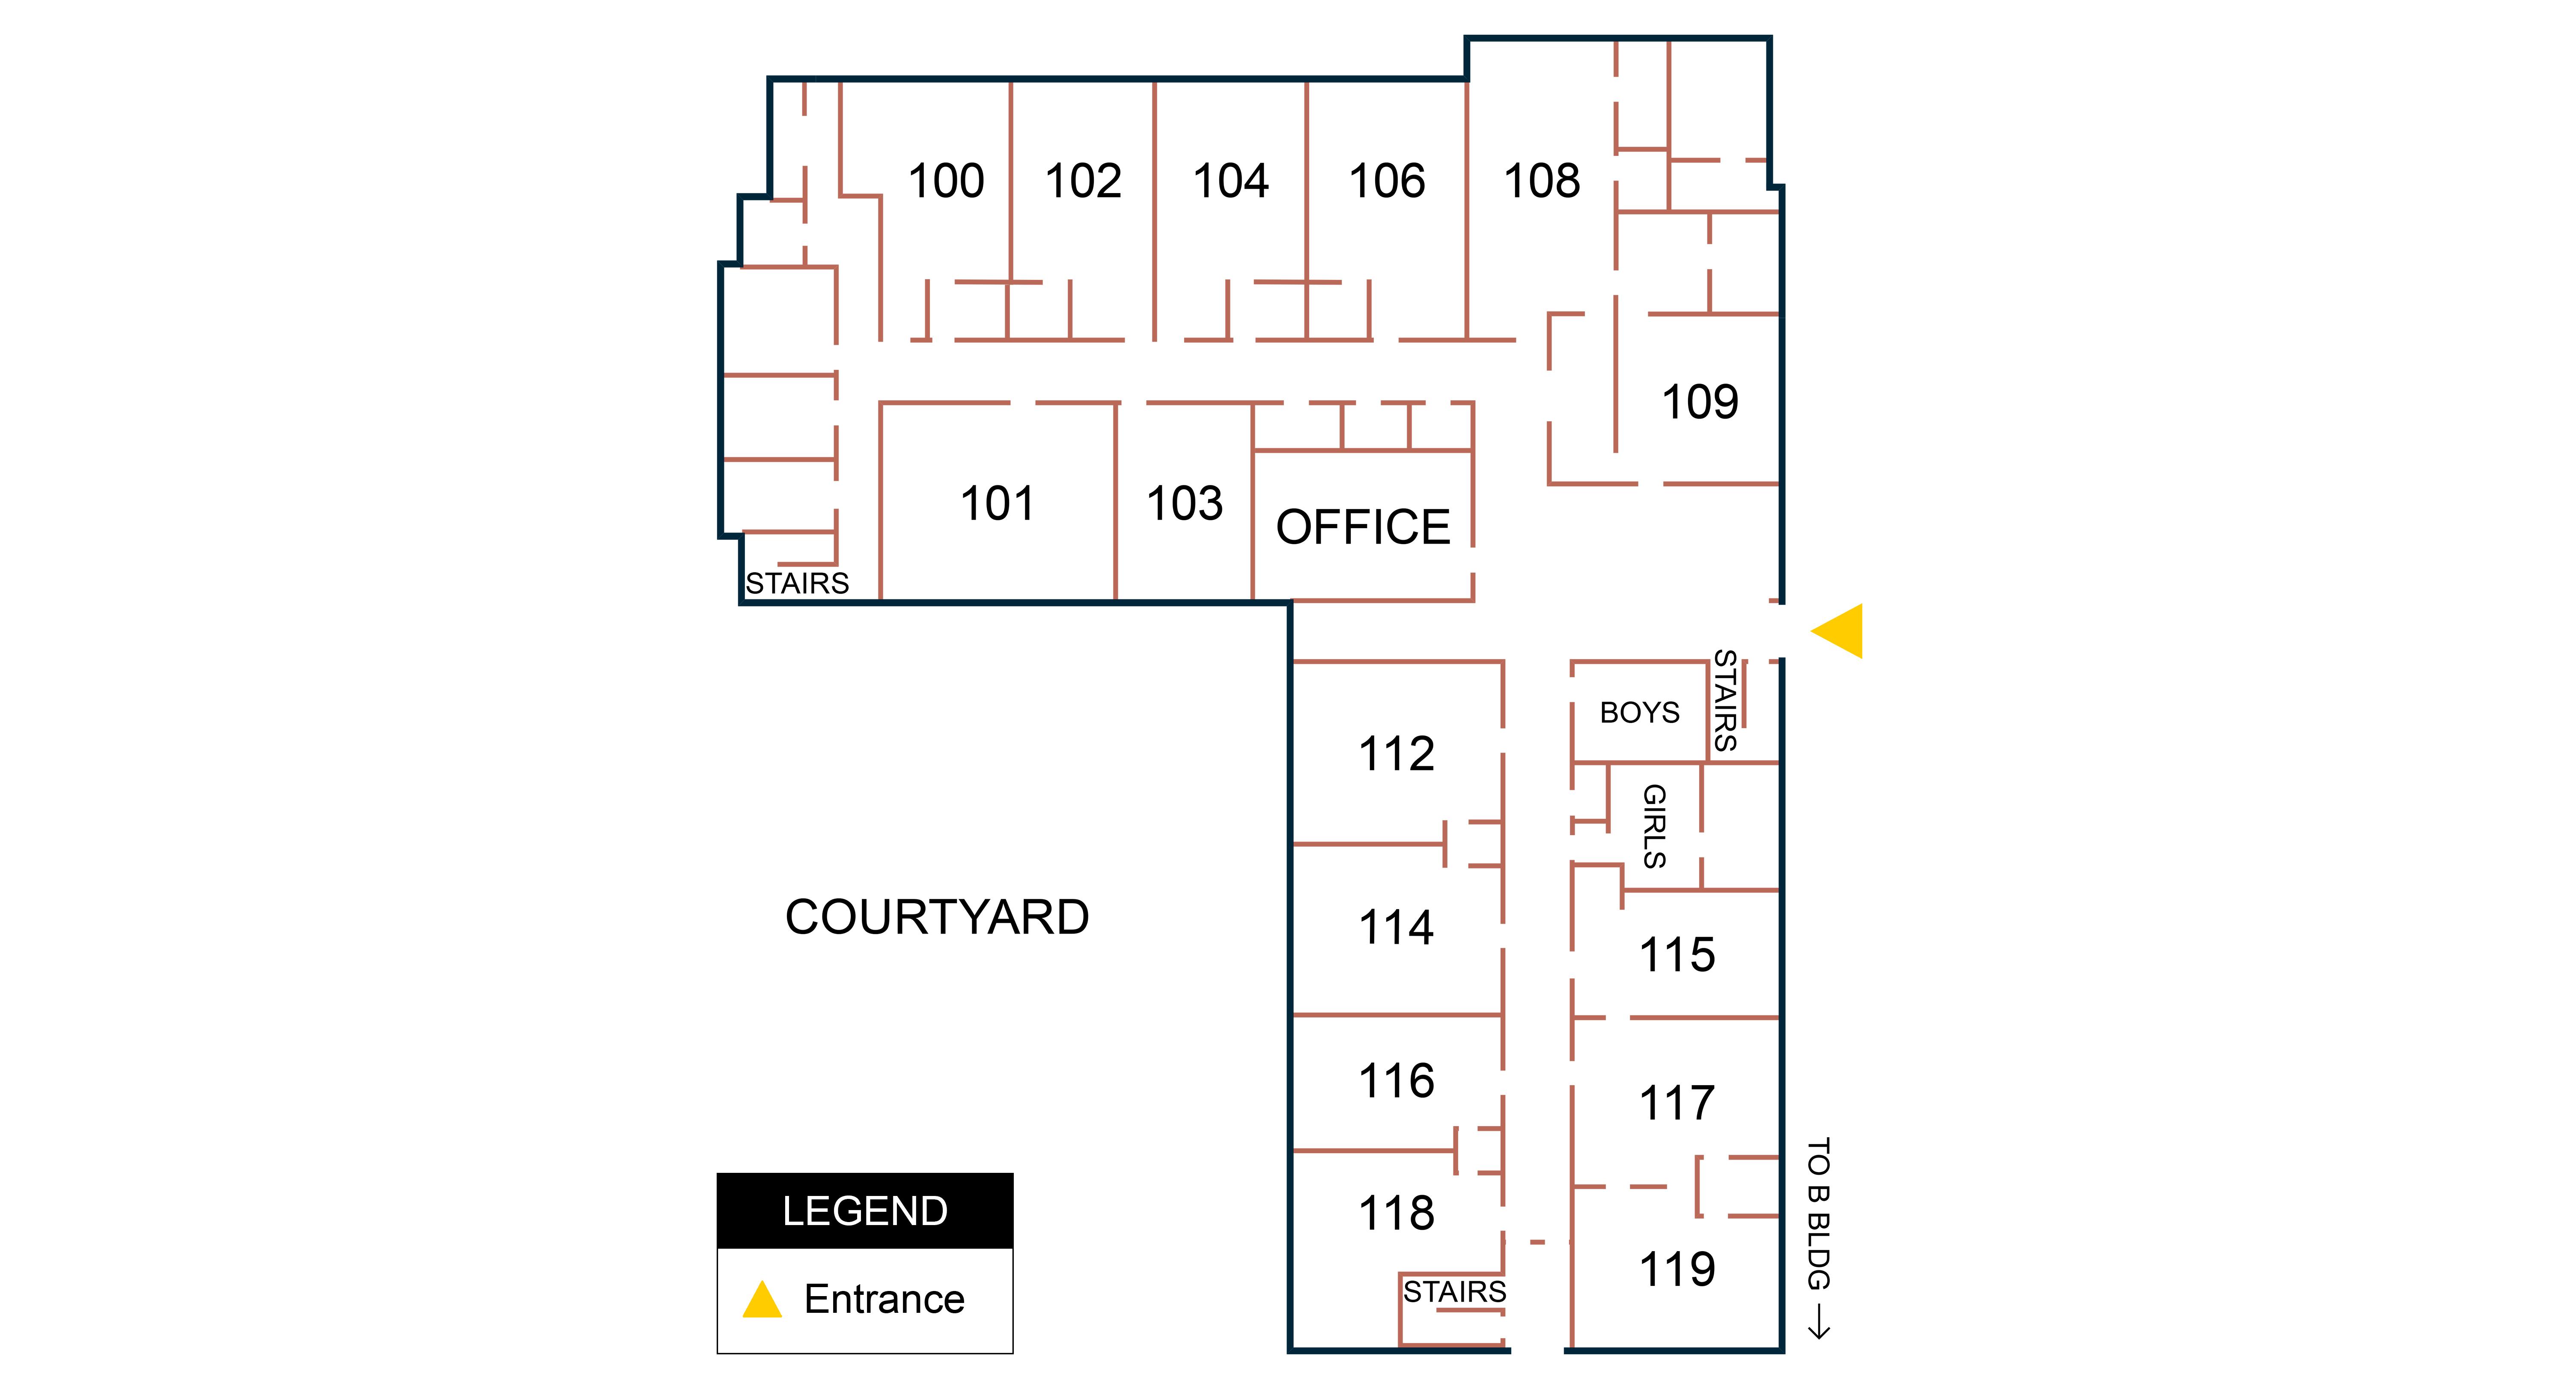 Building A - 1st Floor Map